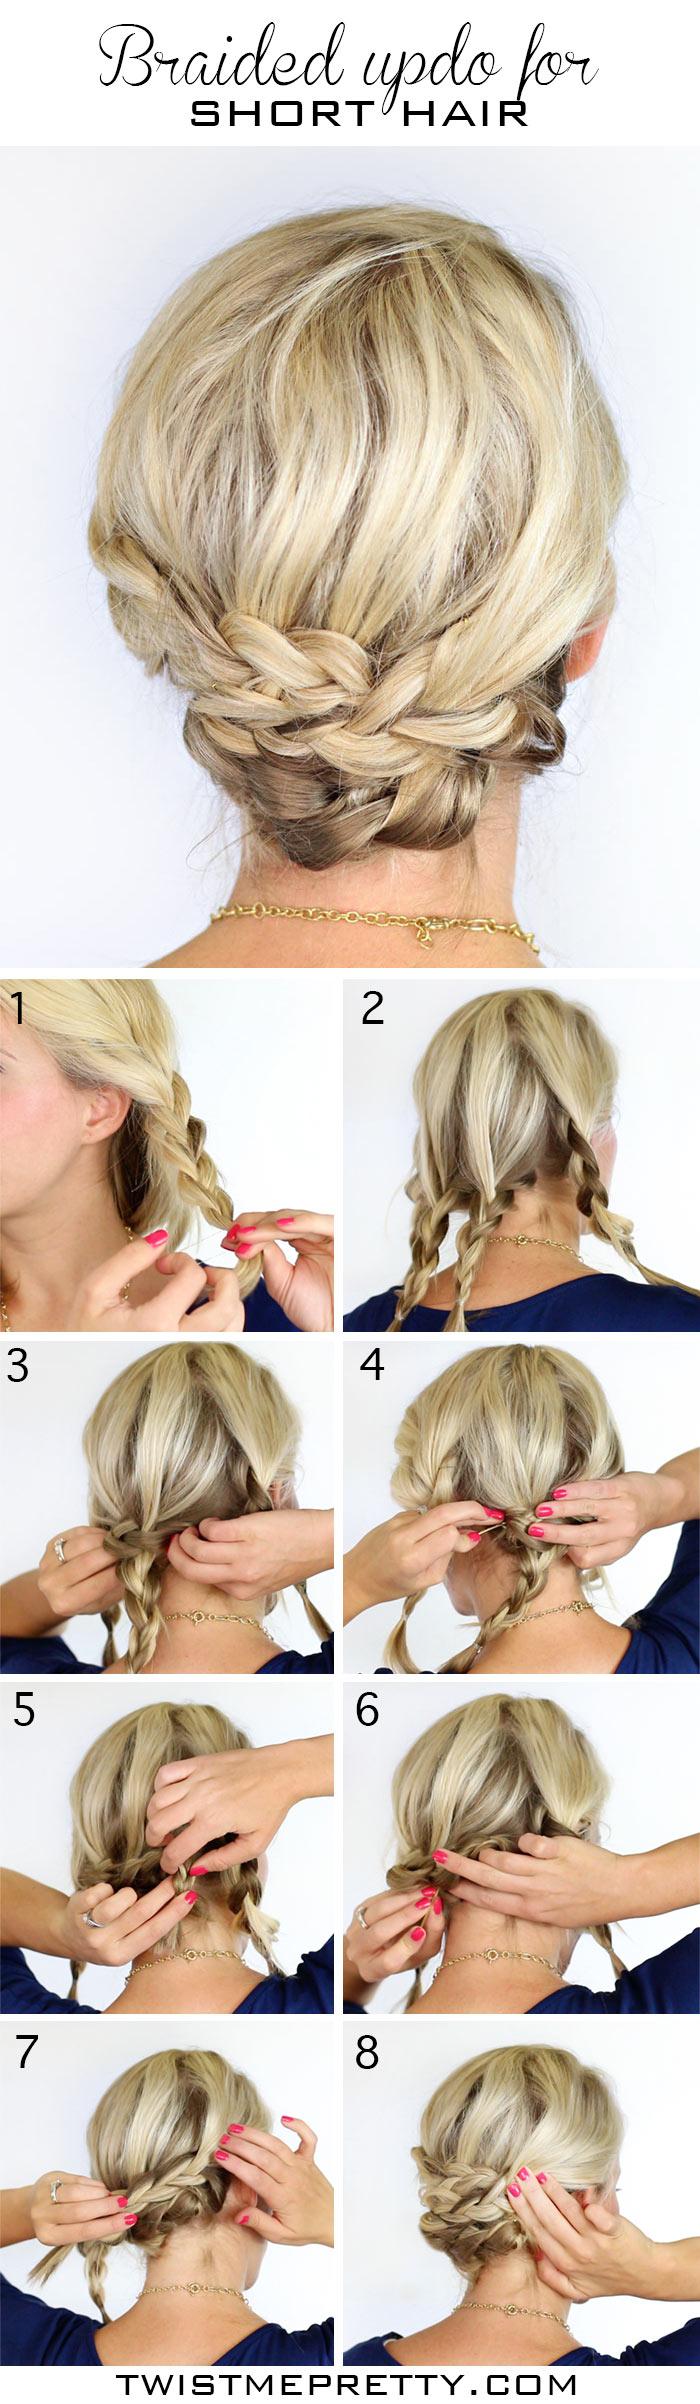 bohemian braids for short hair